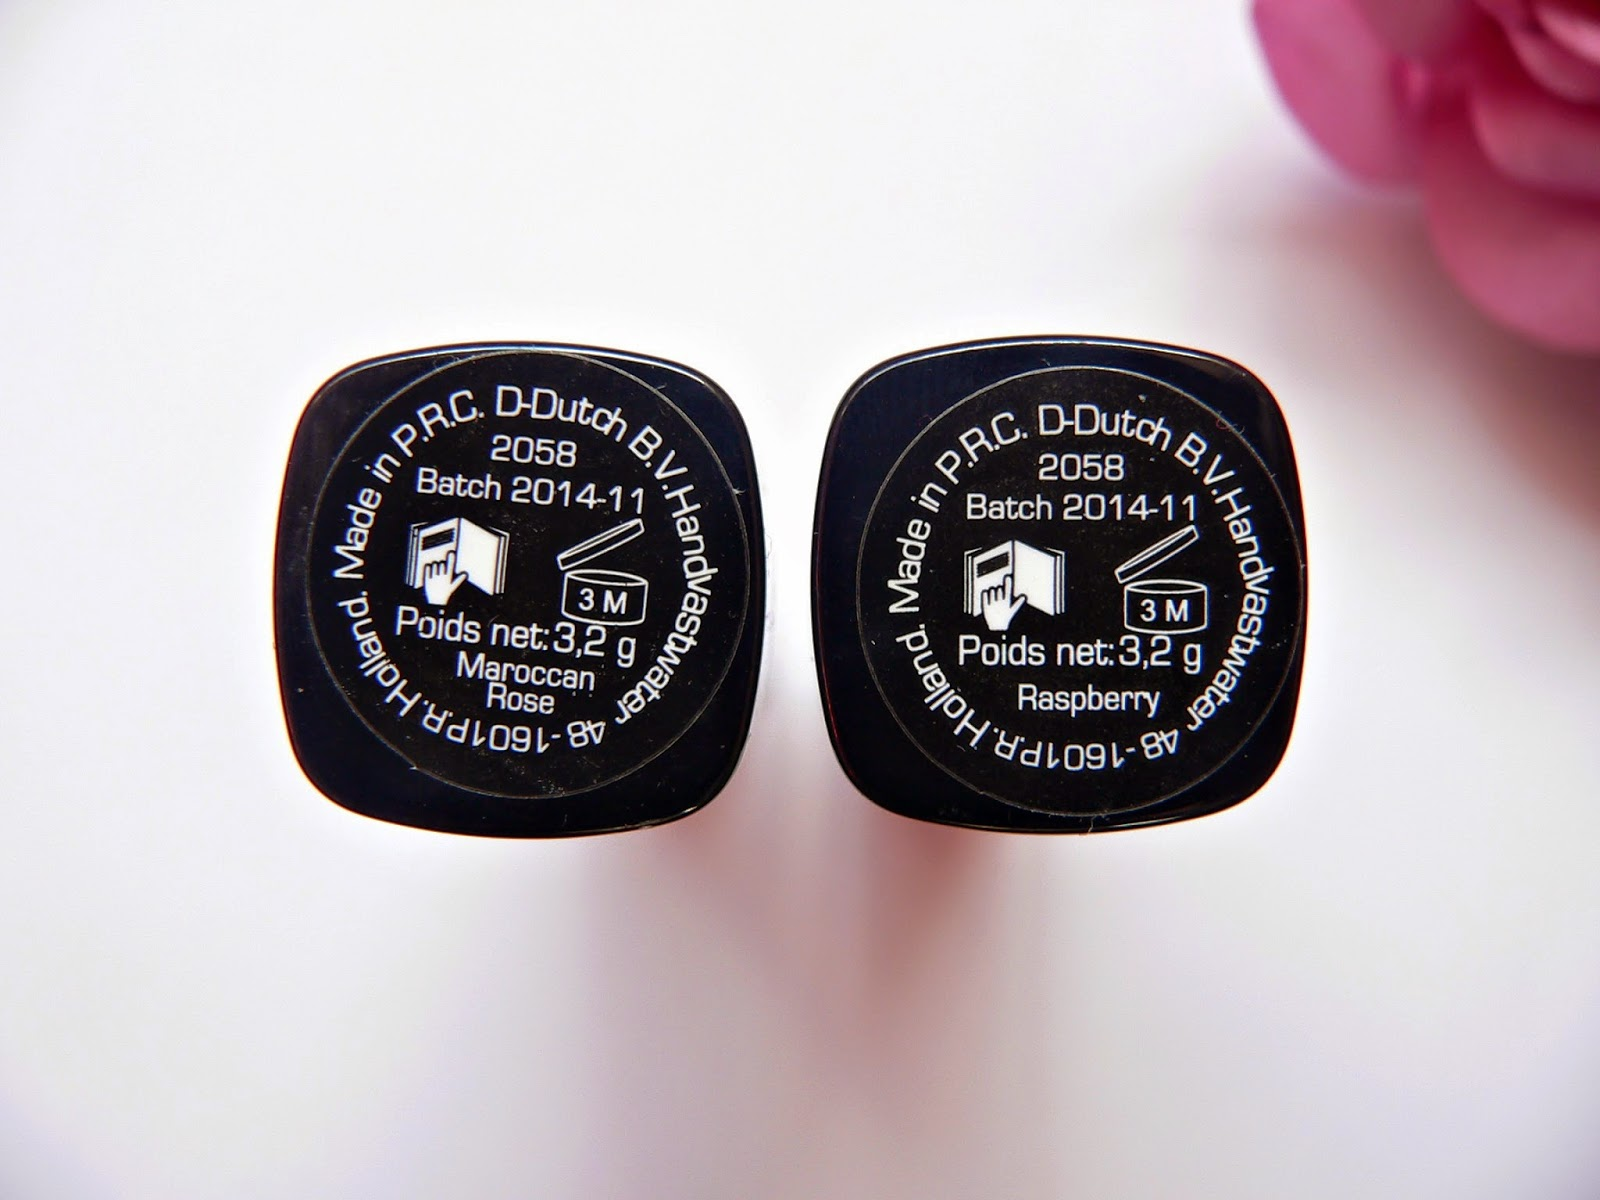 lipstick-addict.nl, review, swatches, lipstick, lipsticks, action, max&more, budget, roze, shoplog, maroccan rose, raspberry